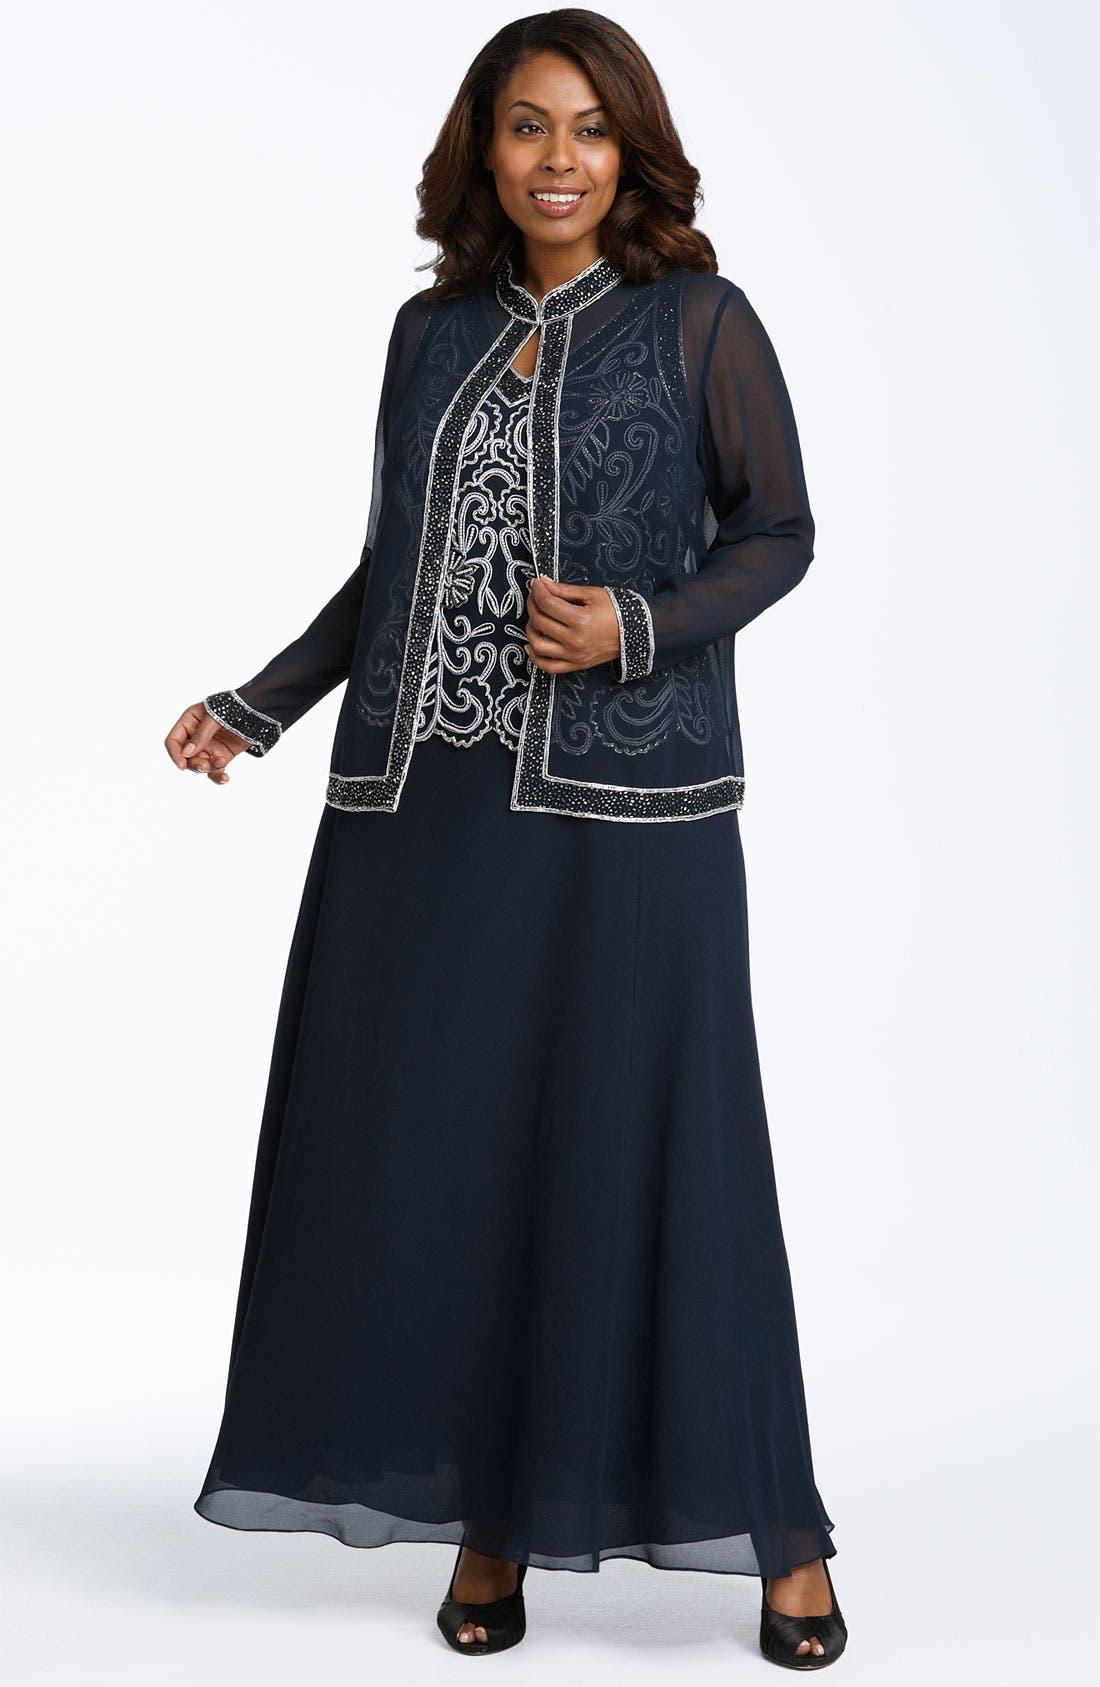 Main Image - J Kara Sheer Beaded Chiffon Gown with Jacket (Plus)